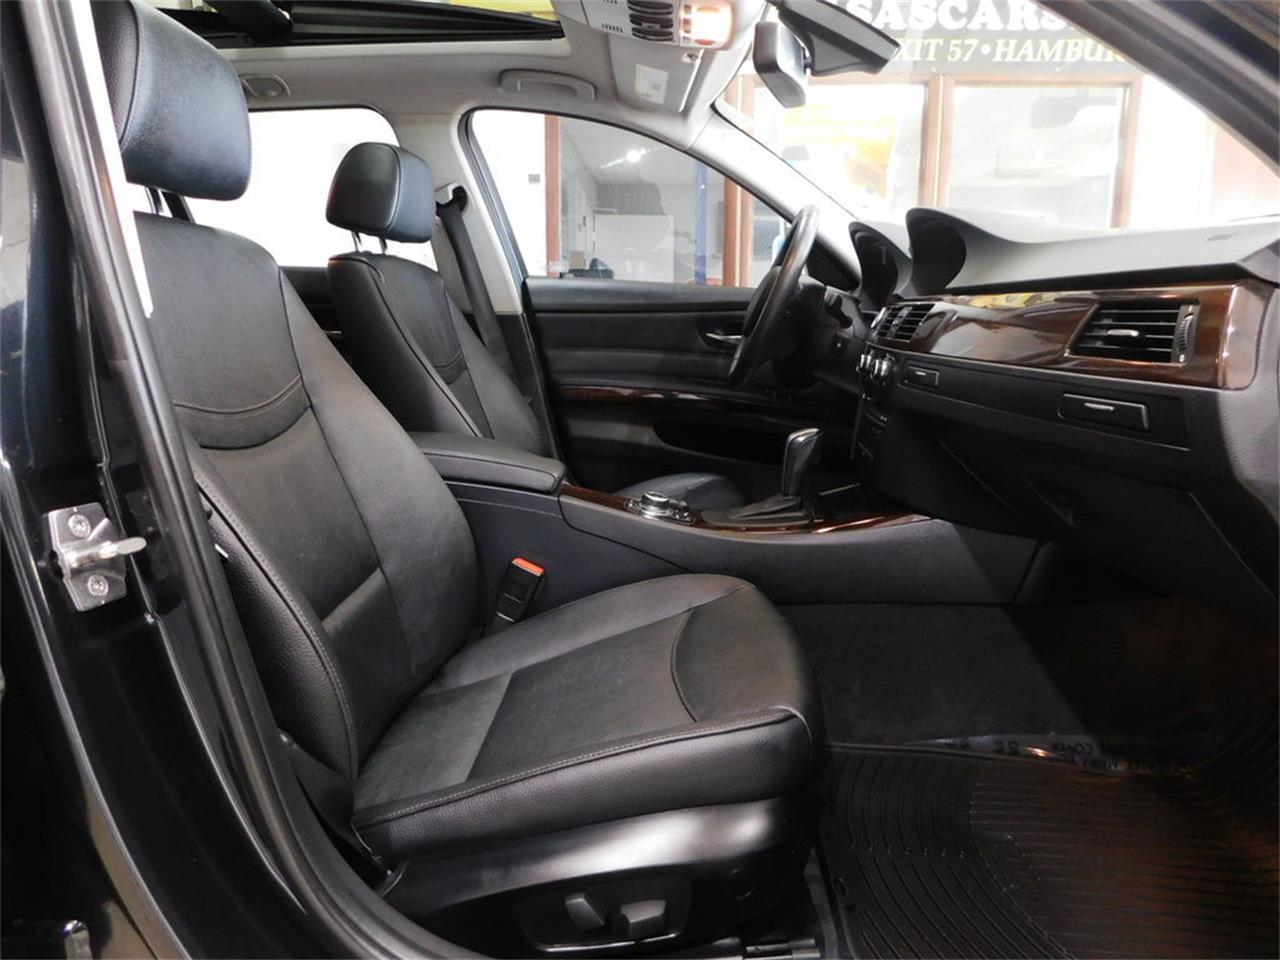 2012 BMW 3 Series (CC-1392720) for sale in Hamburg, New York